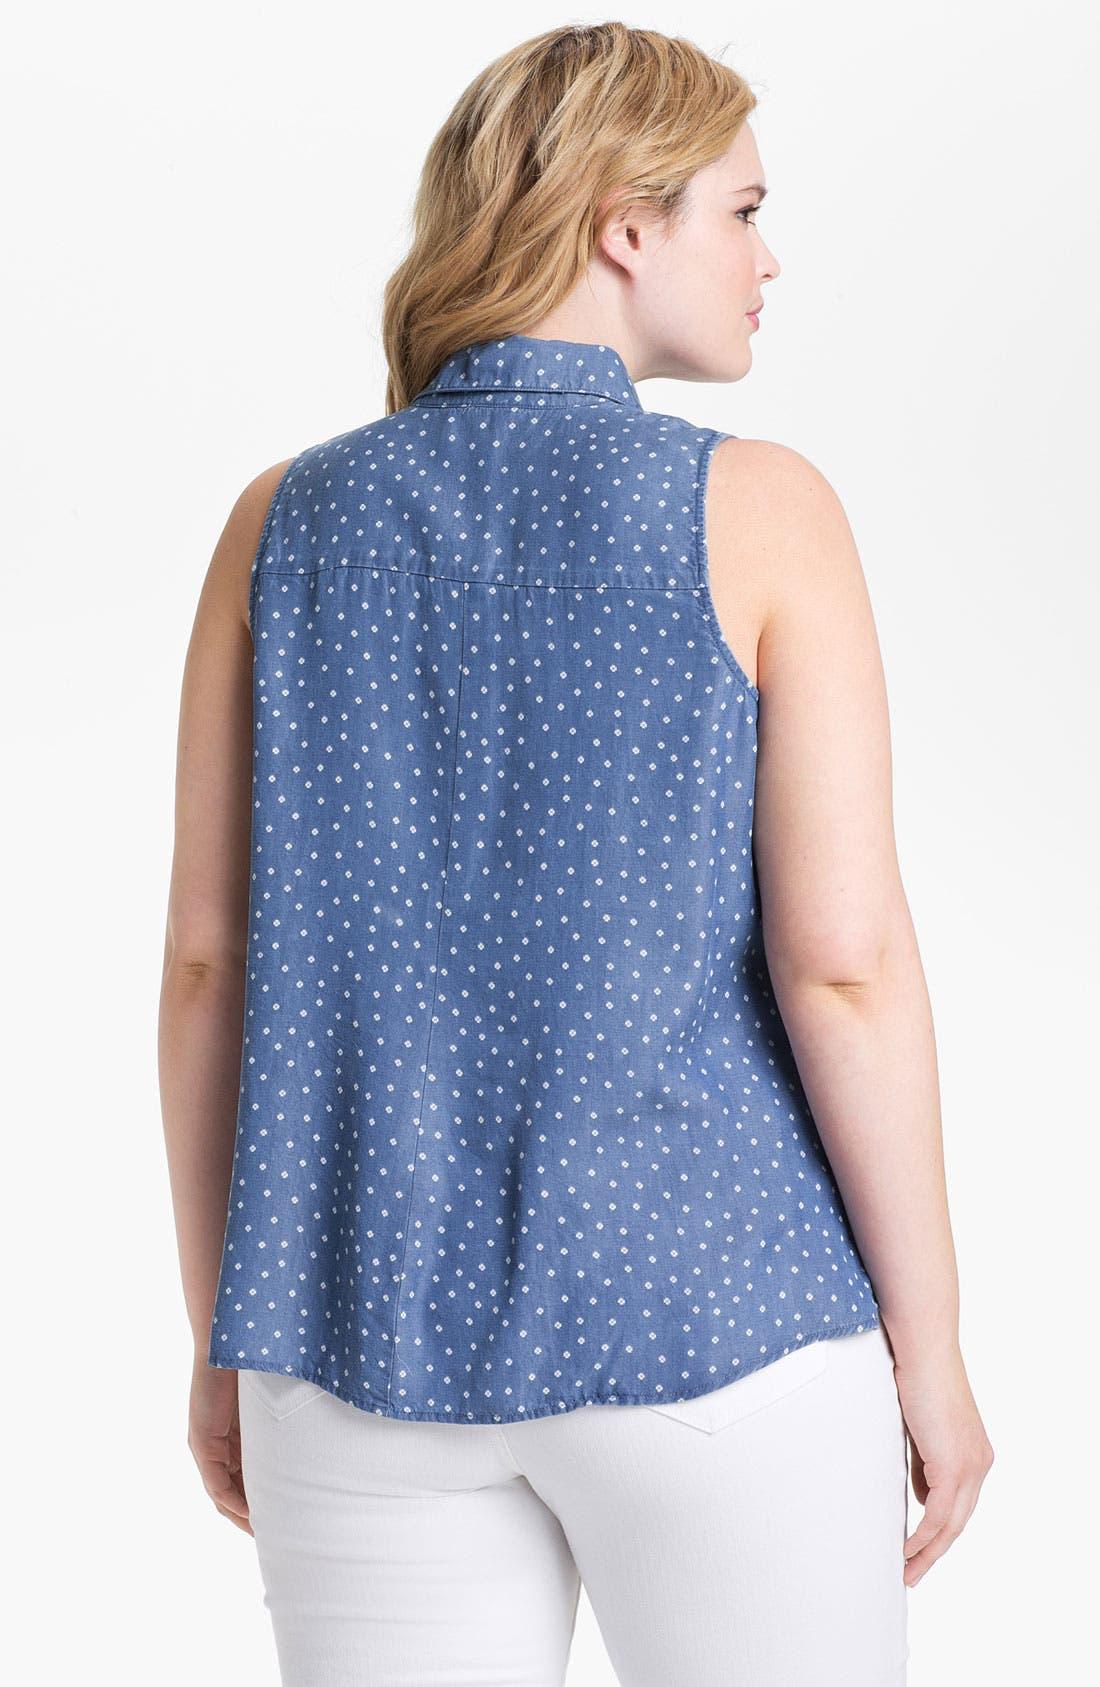 Alternate Image 2  - Splendid 'Ditzy' Polka Dot Chambray Shirt (Plus)